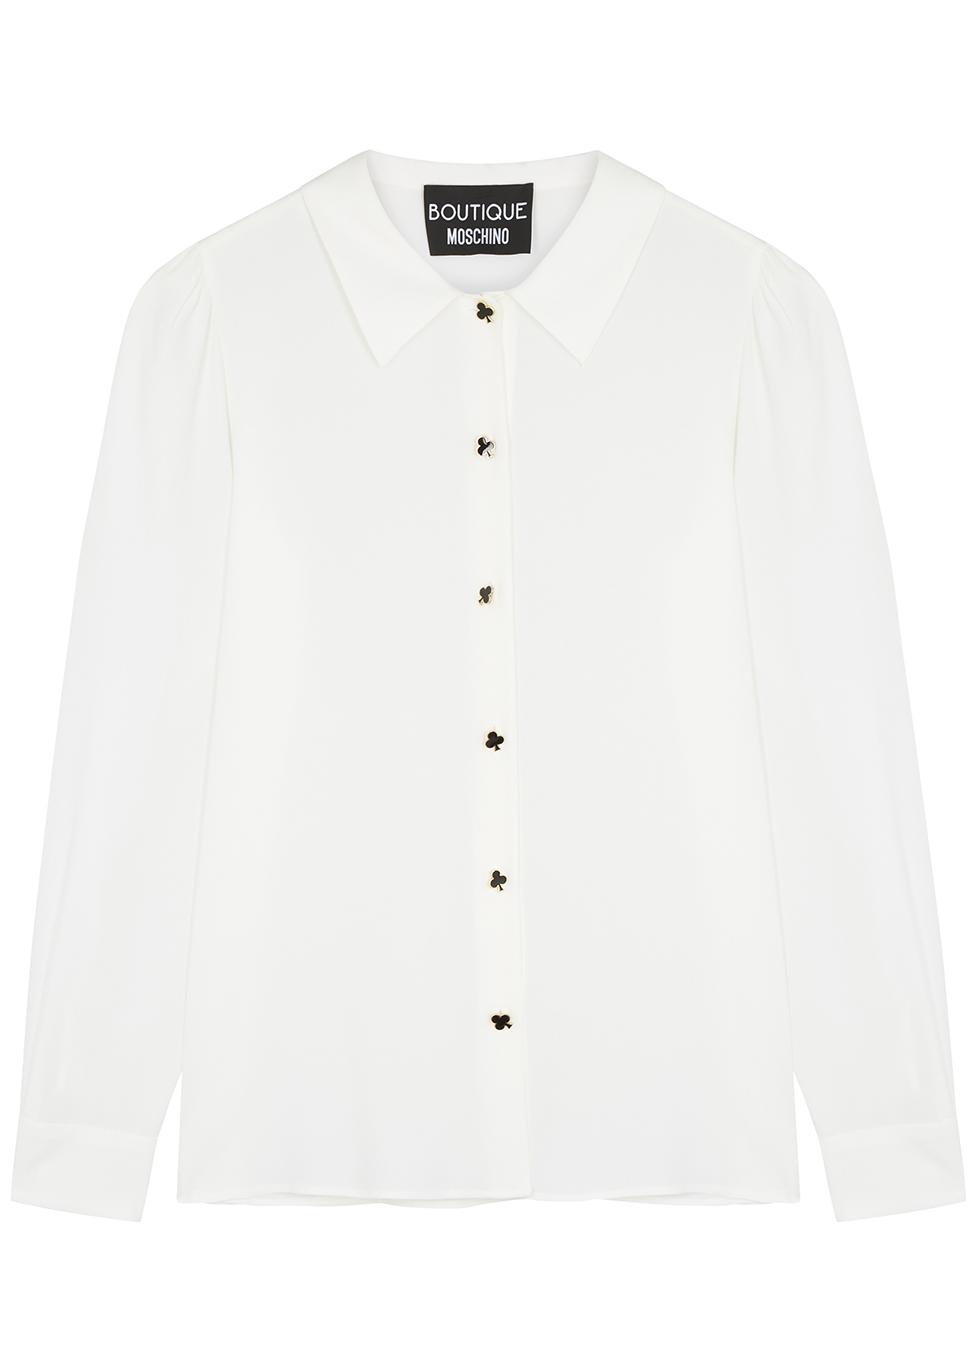 fb0bda90c5 Boutique Moschino - Italian Designer Brands - Harvey Nichols